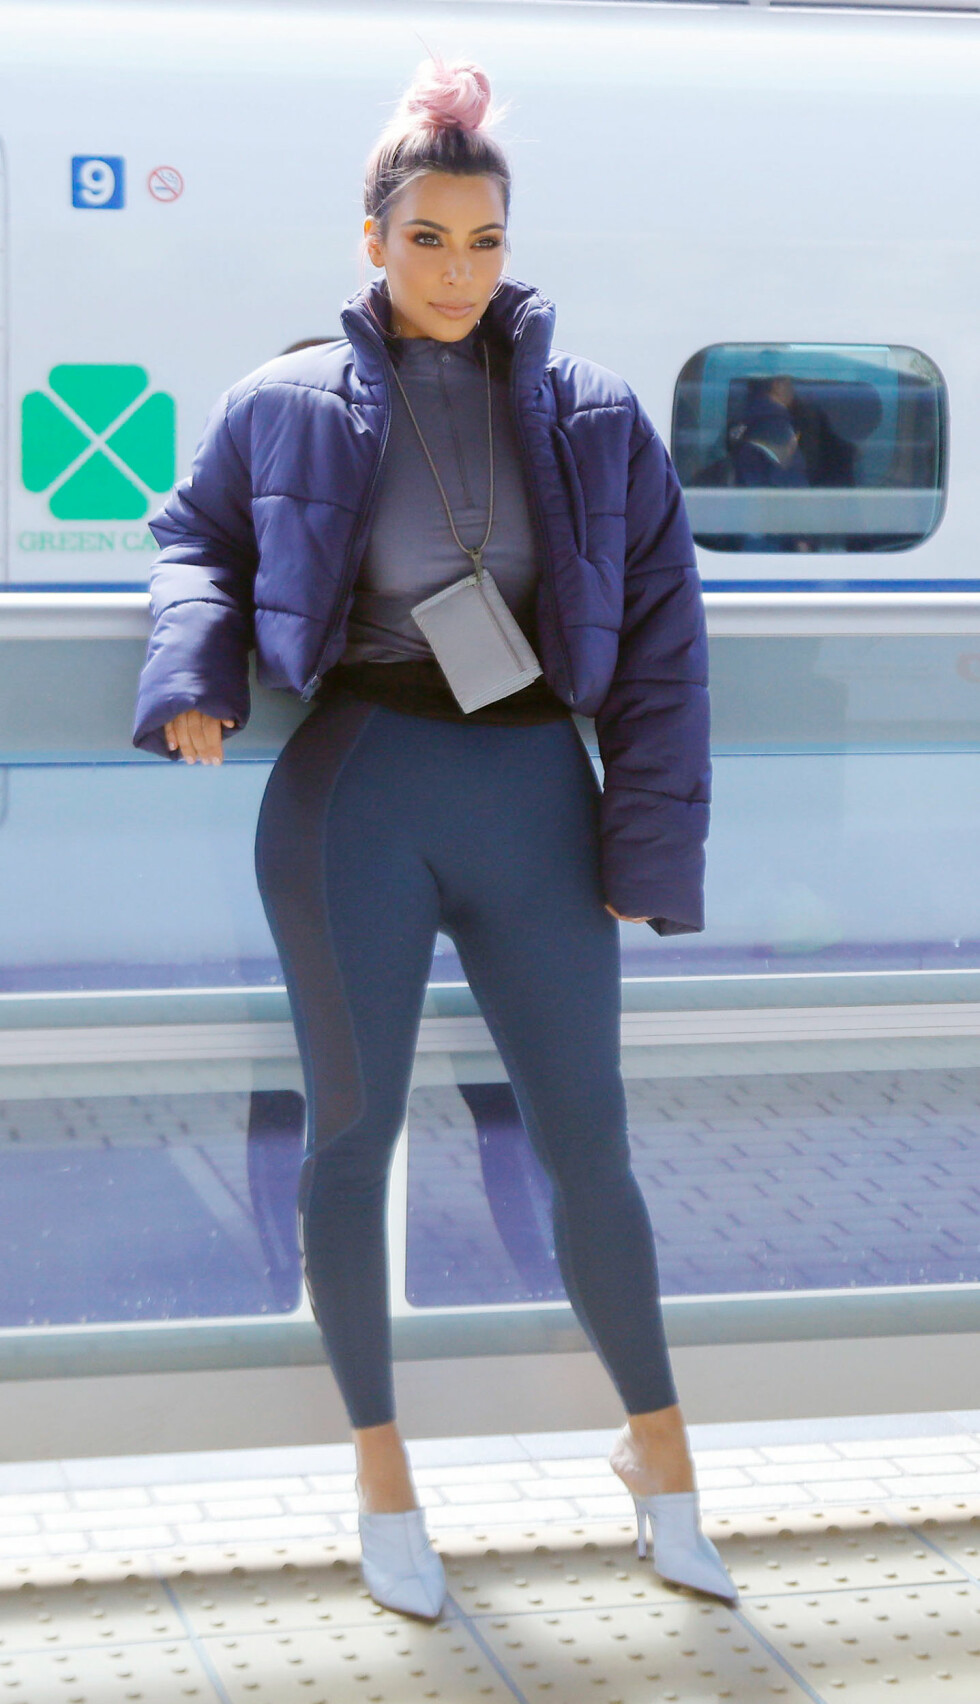 NÅ: Kim Kardashian fotografert i Tokyo i Japan i mars. Foto: NTB Scanpix